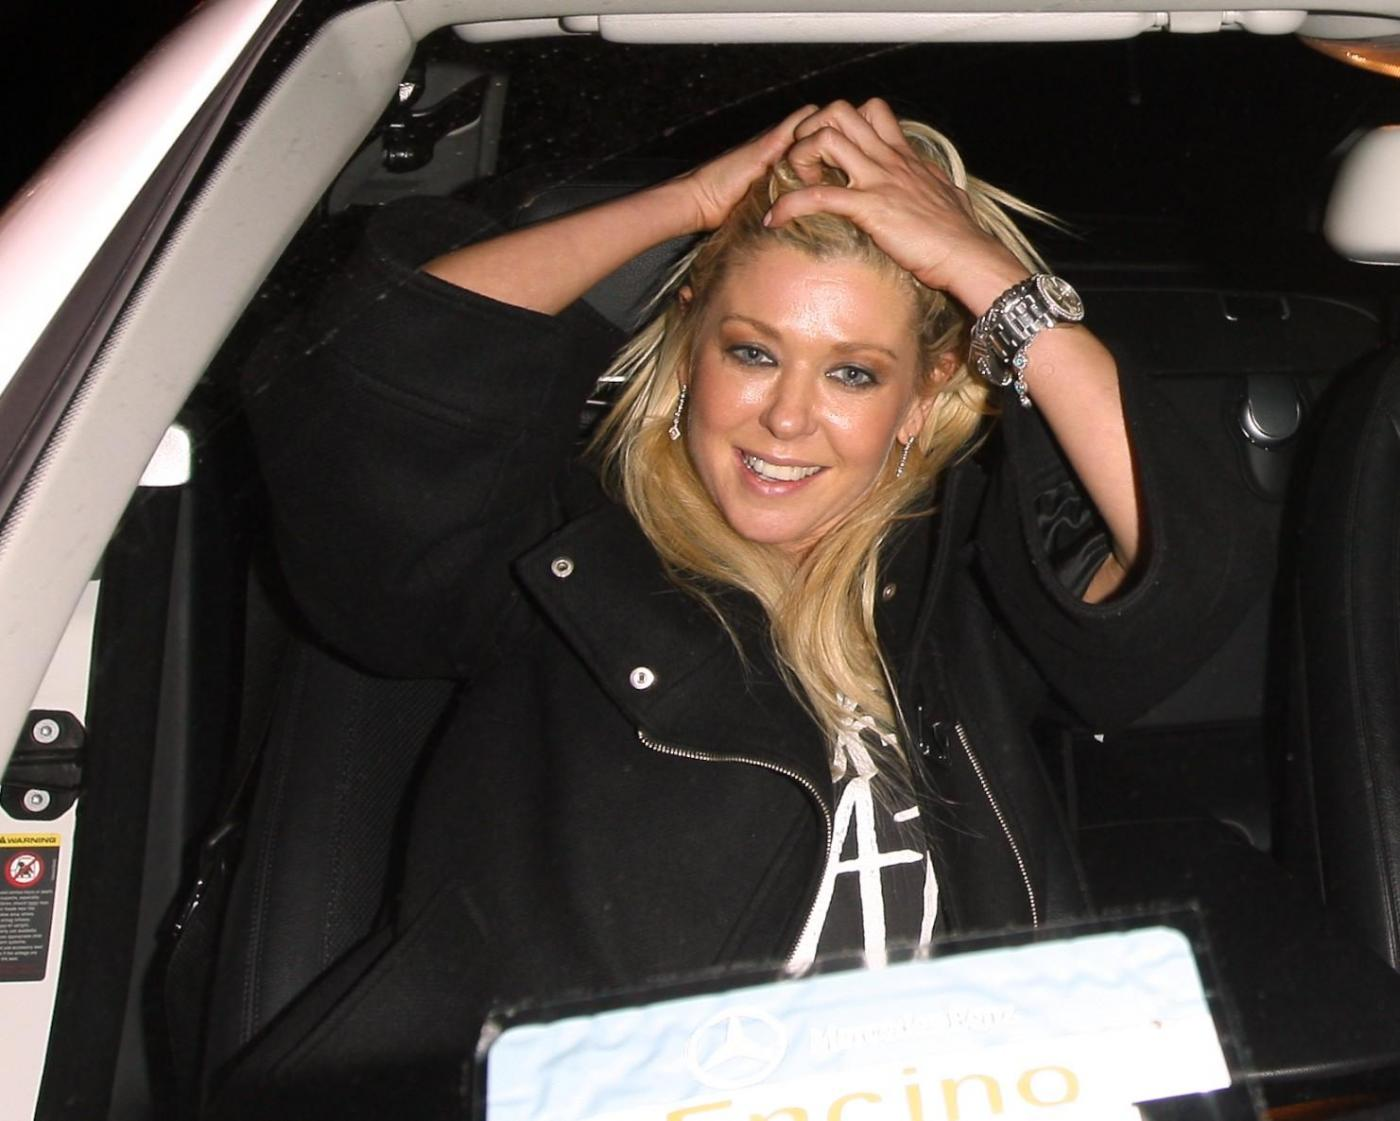 Tara Reid ubriaca lascia il ristorante Lin a West Hollywood dopo aver cenato01